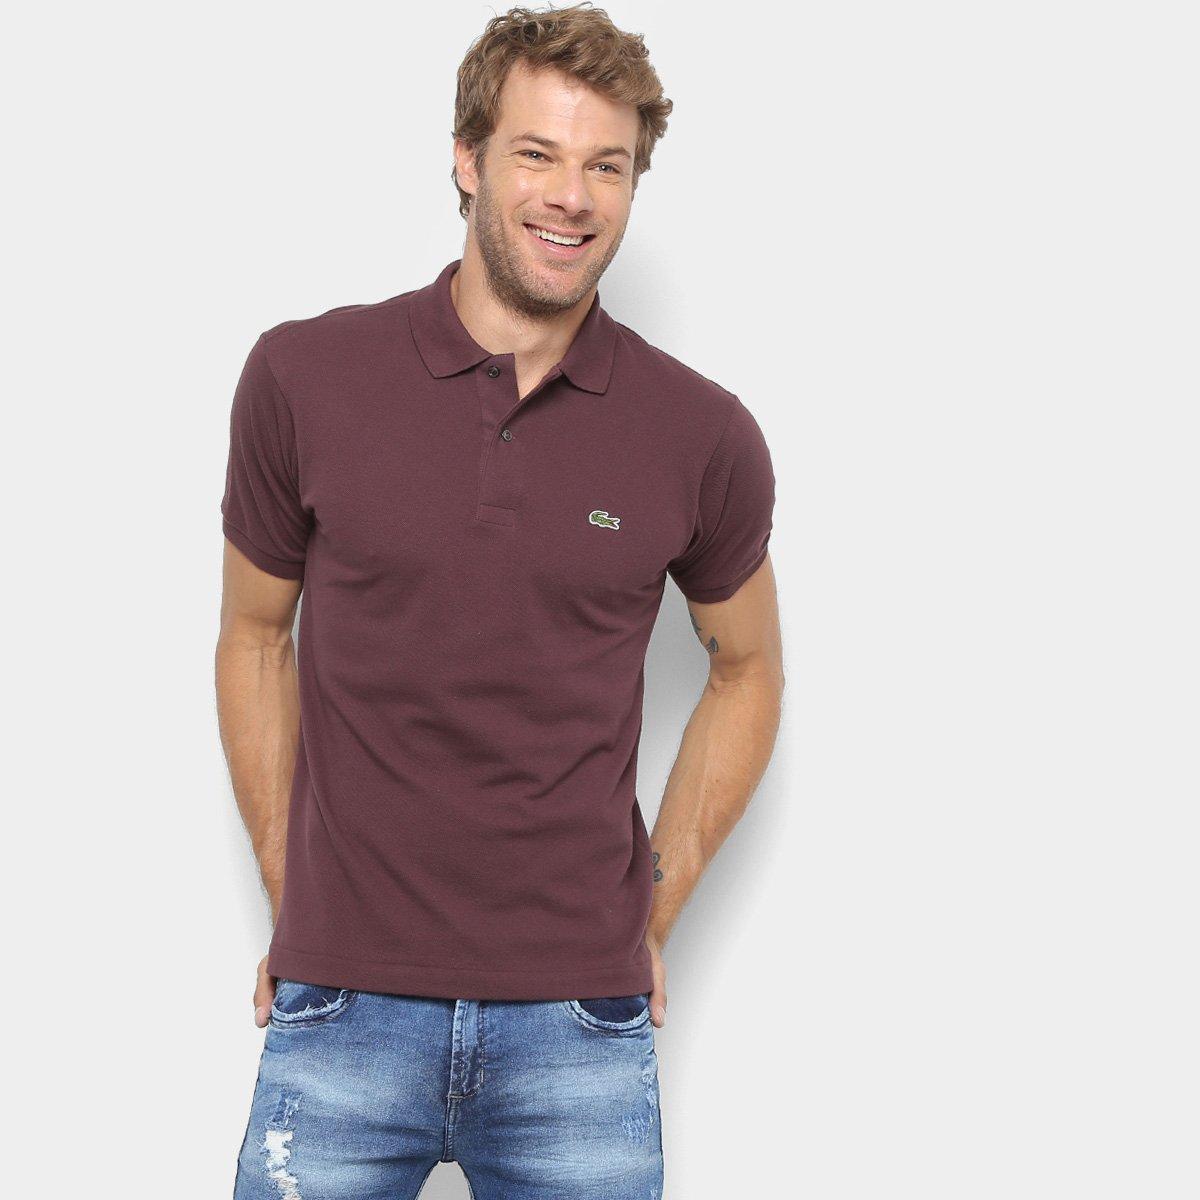 c352663714 Camisa Polo Lacoste Original Fit Masculina